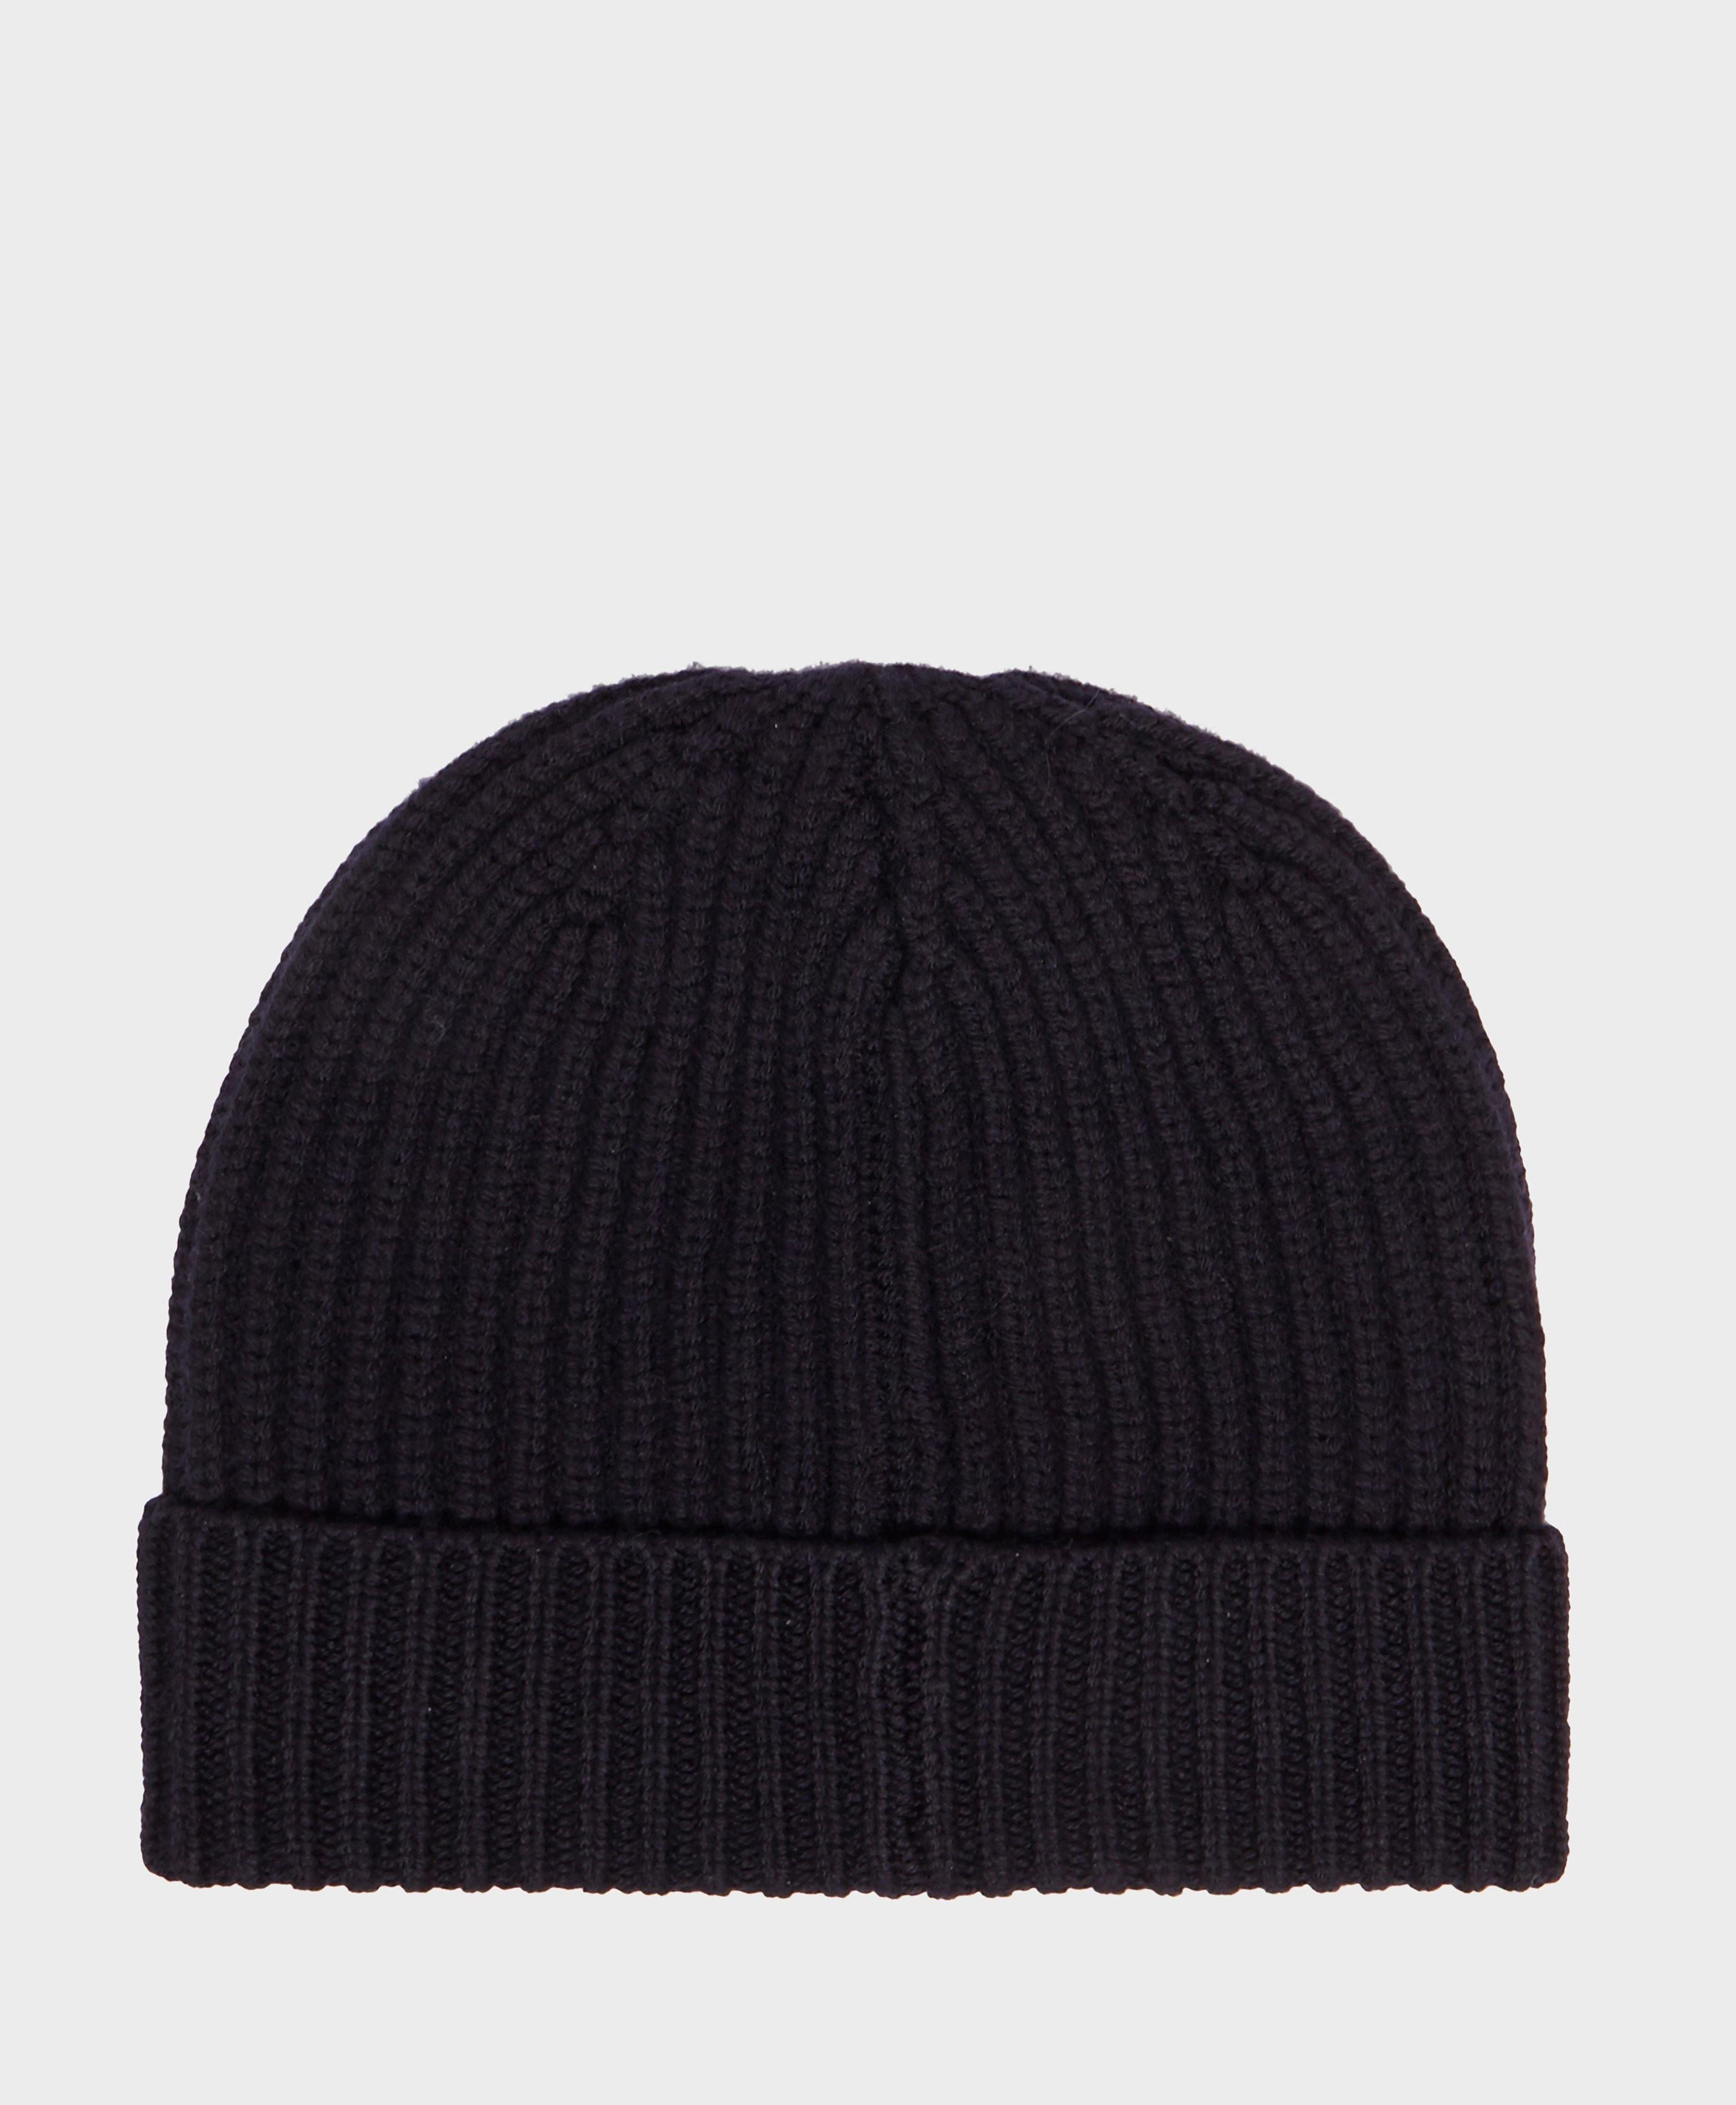 Emporio Armani Wool Beanie